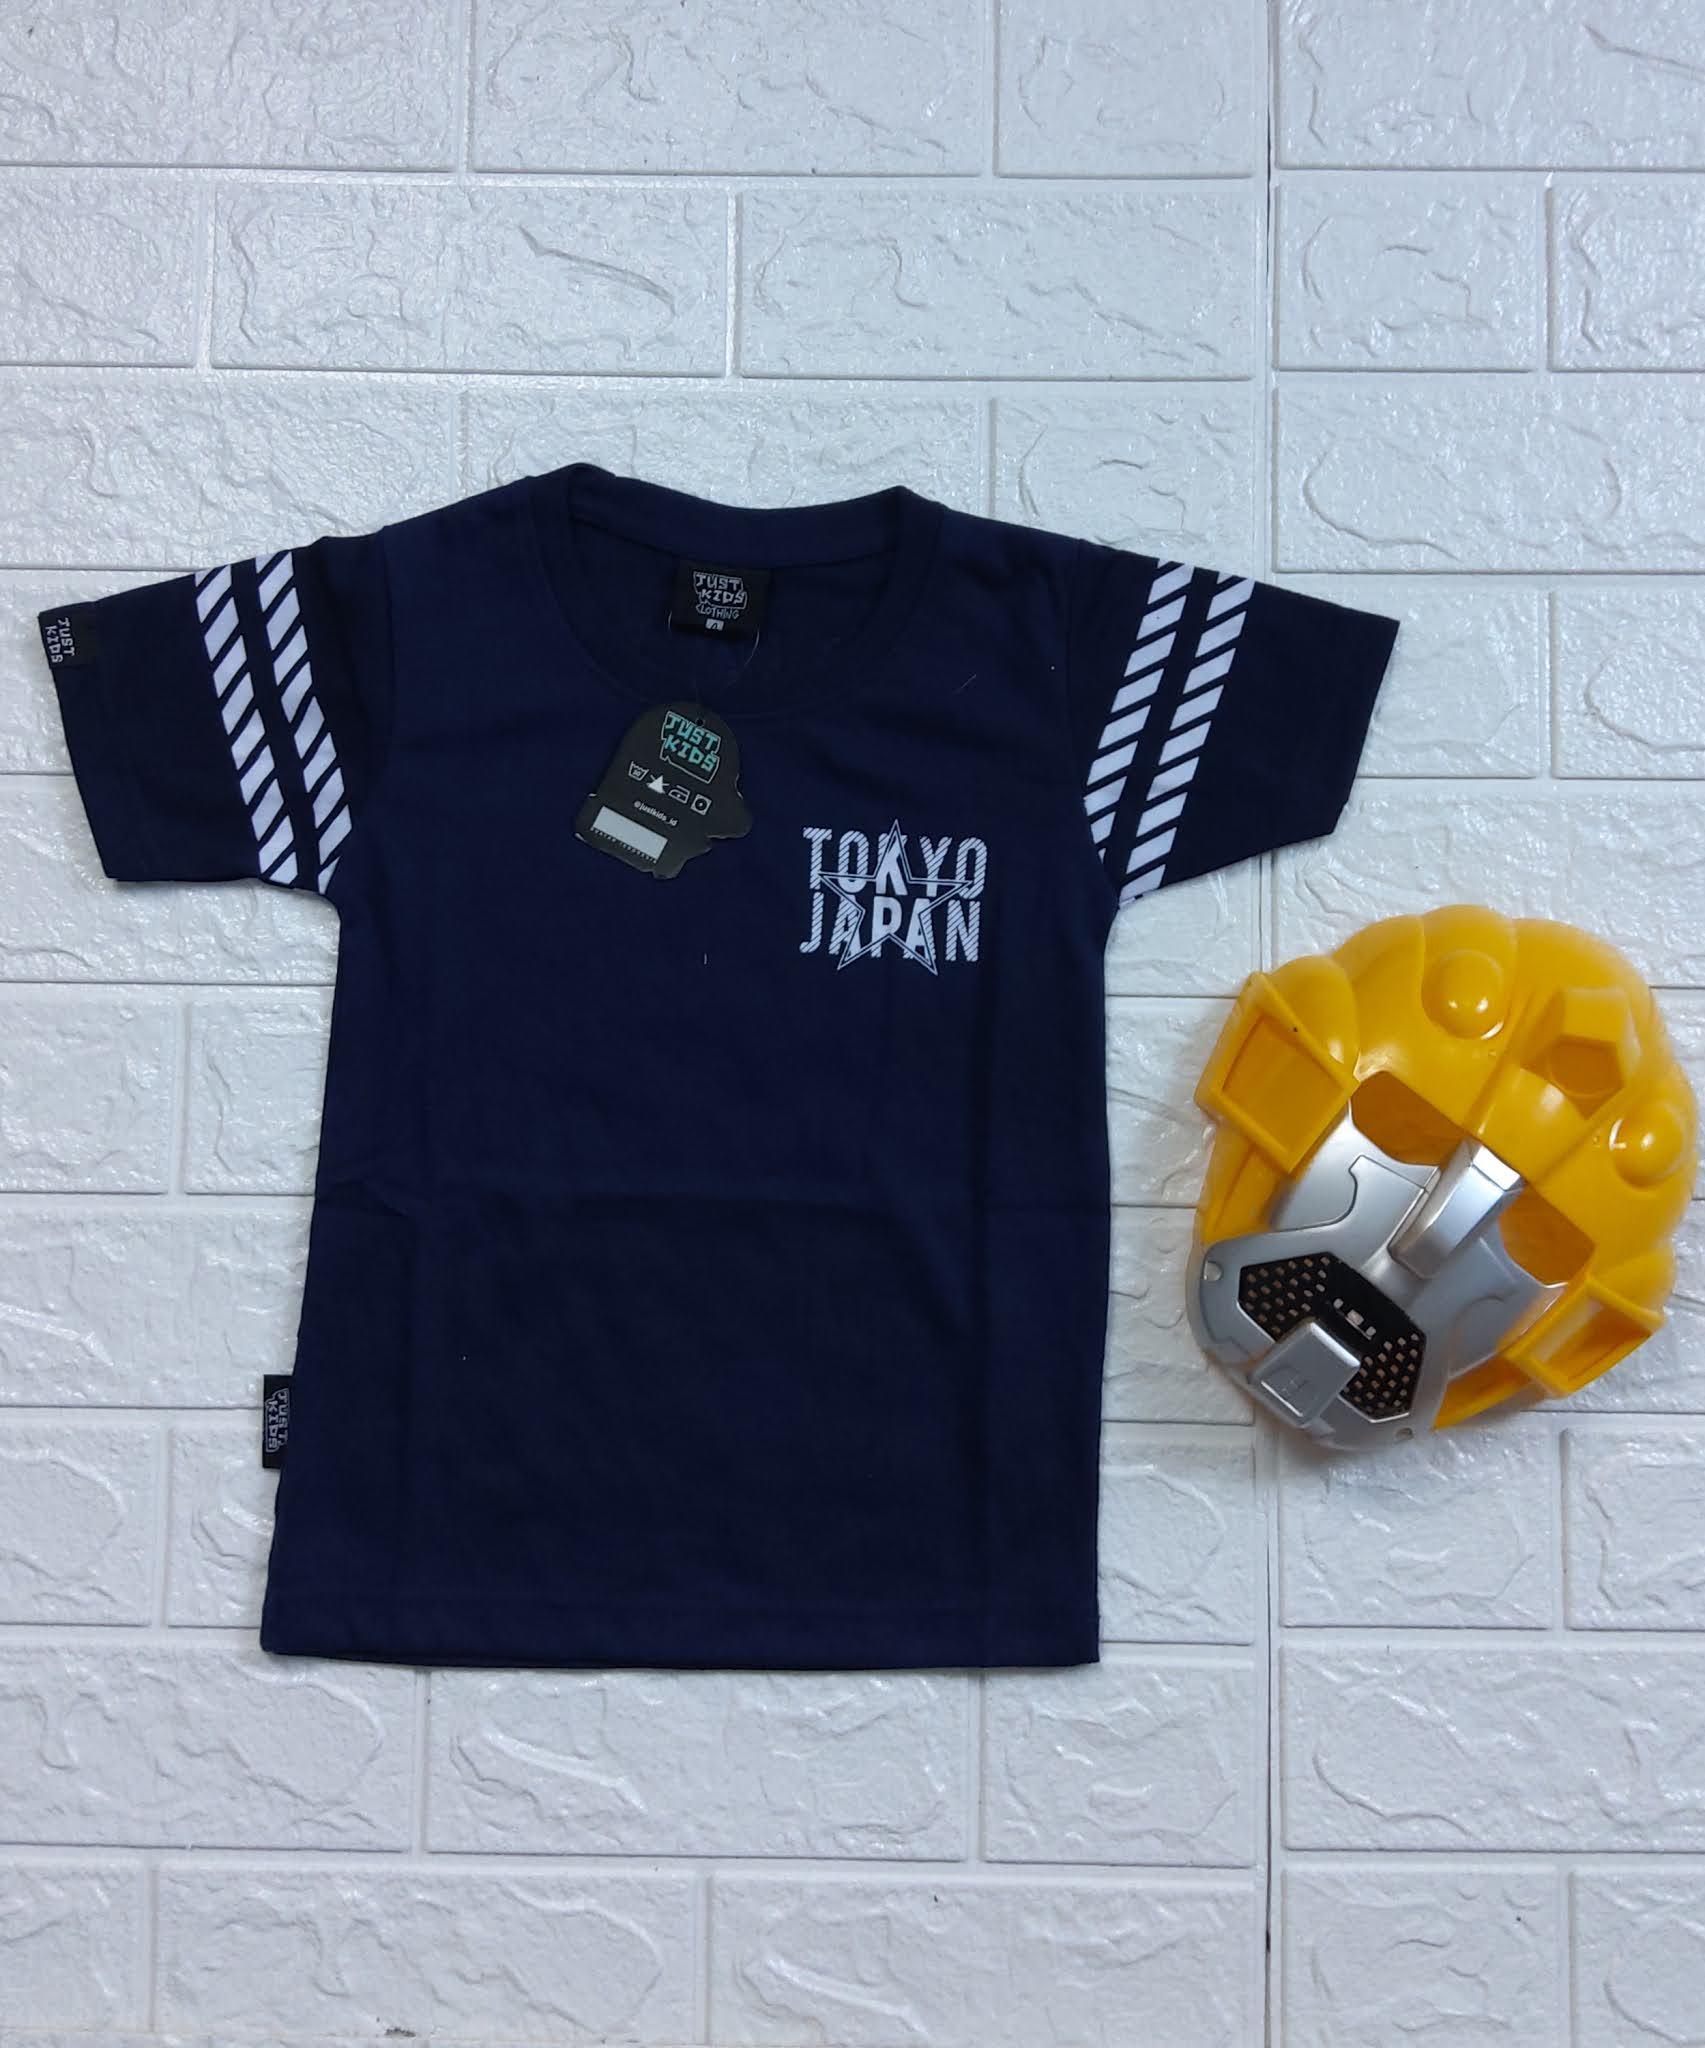 JUST KIDS OBL FASH PDK (TOKYO JAPAN) (ANKL00107)